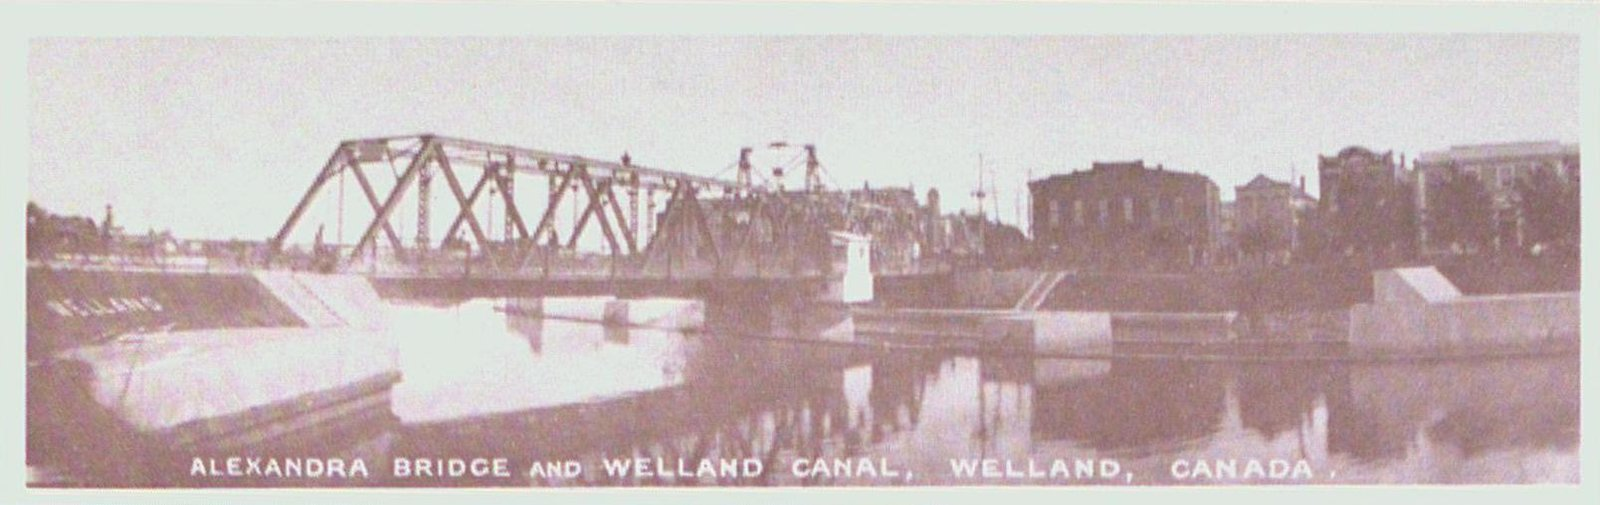 The Alexandra Bridge over the Third Welland Canal